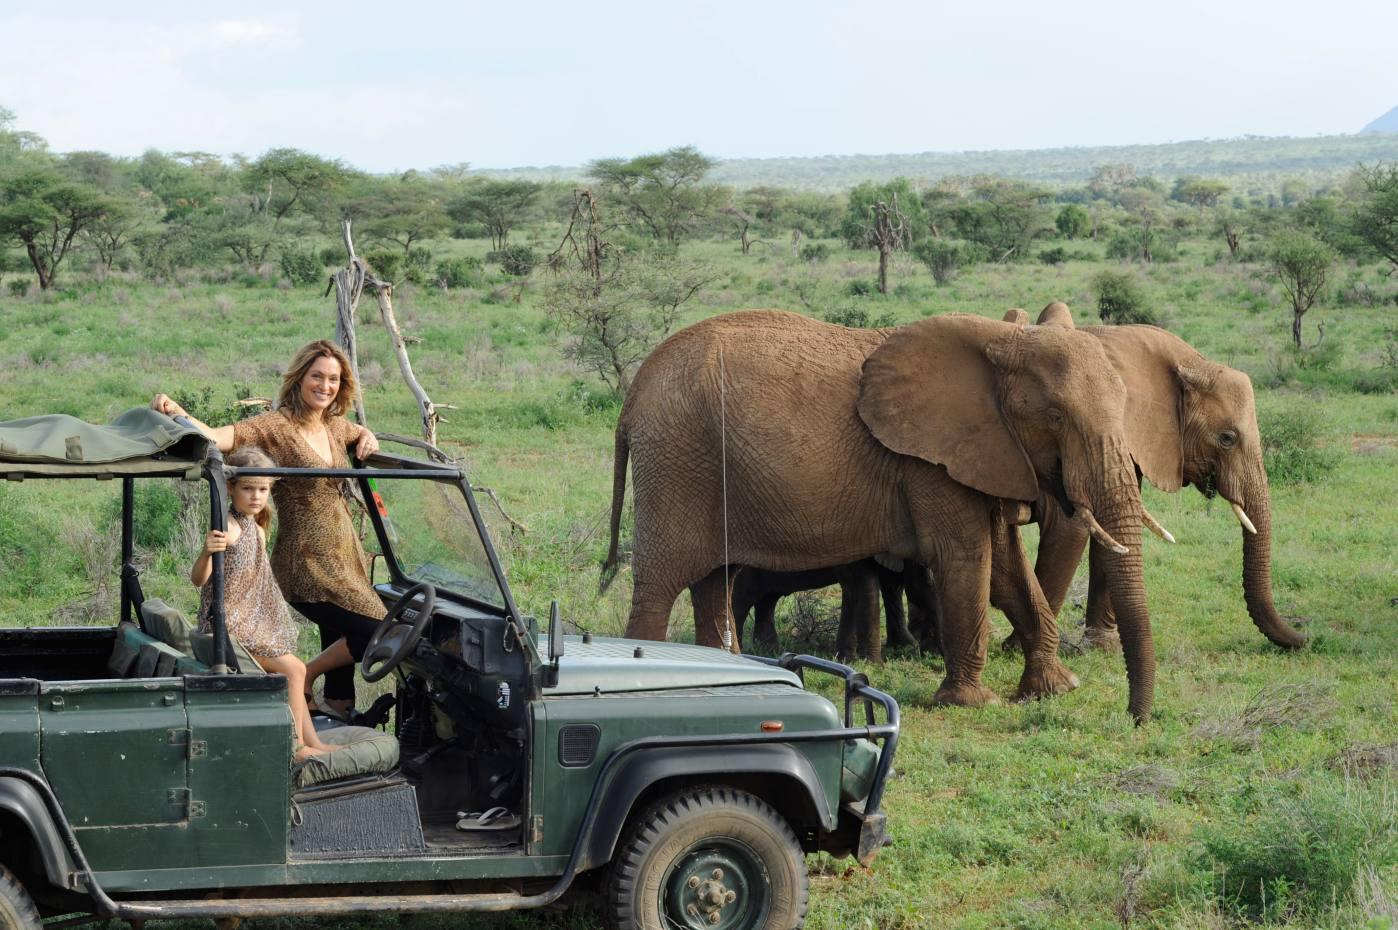 Conservationist Saba Douglas-Hamilton watching elephants in Samburu National Reserve with her daughter